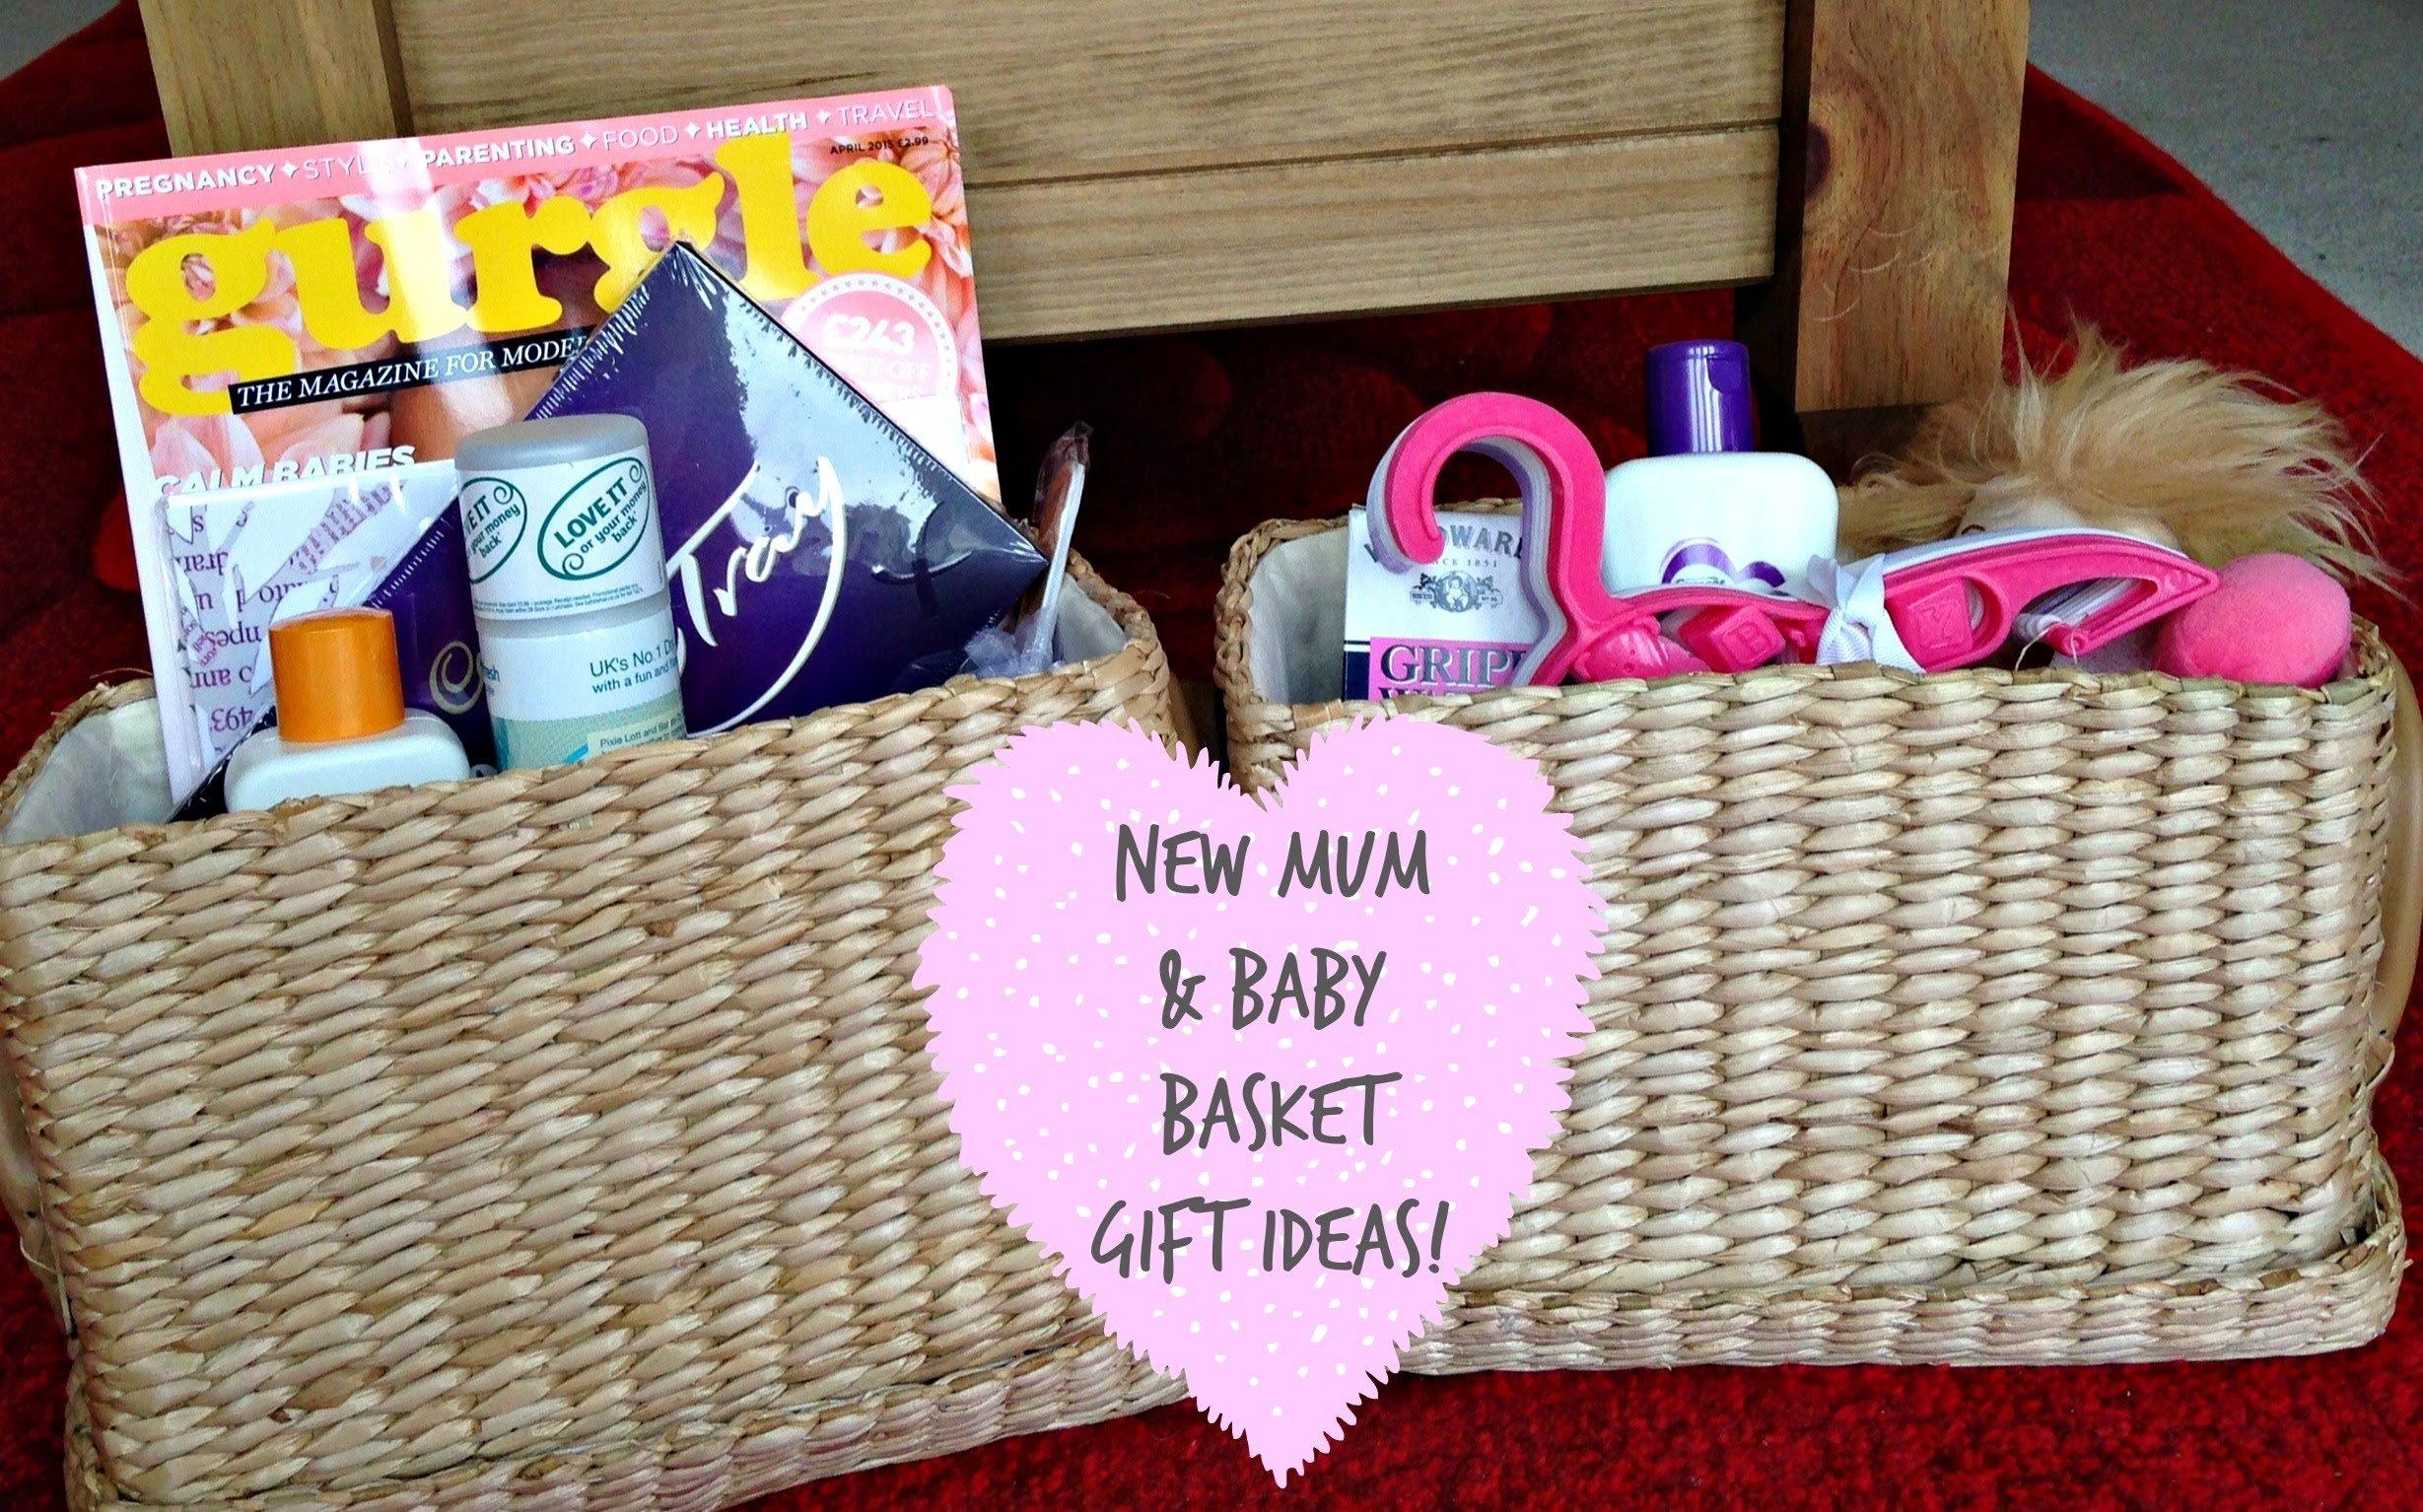 new mum & baby basket gift ideas! | kerry dyer - youtube